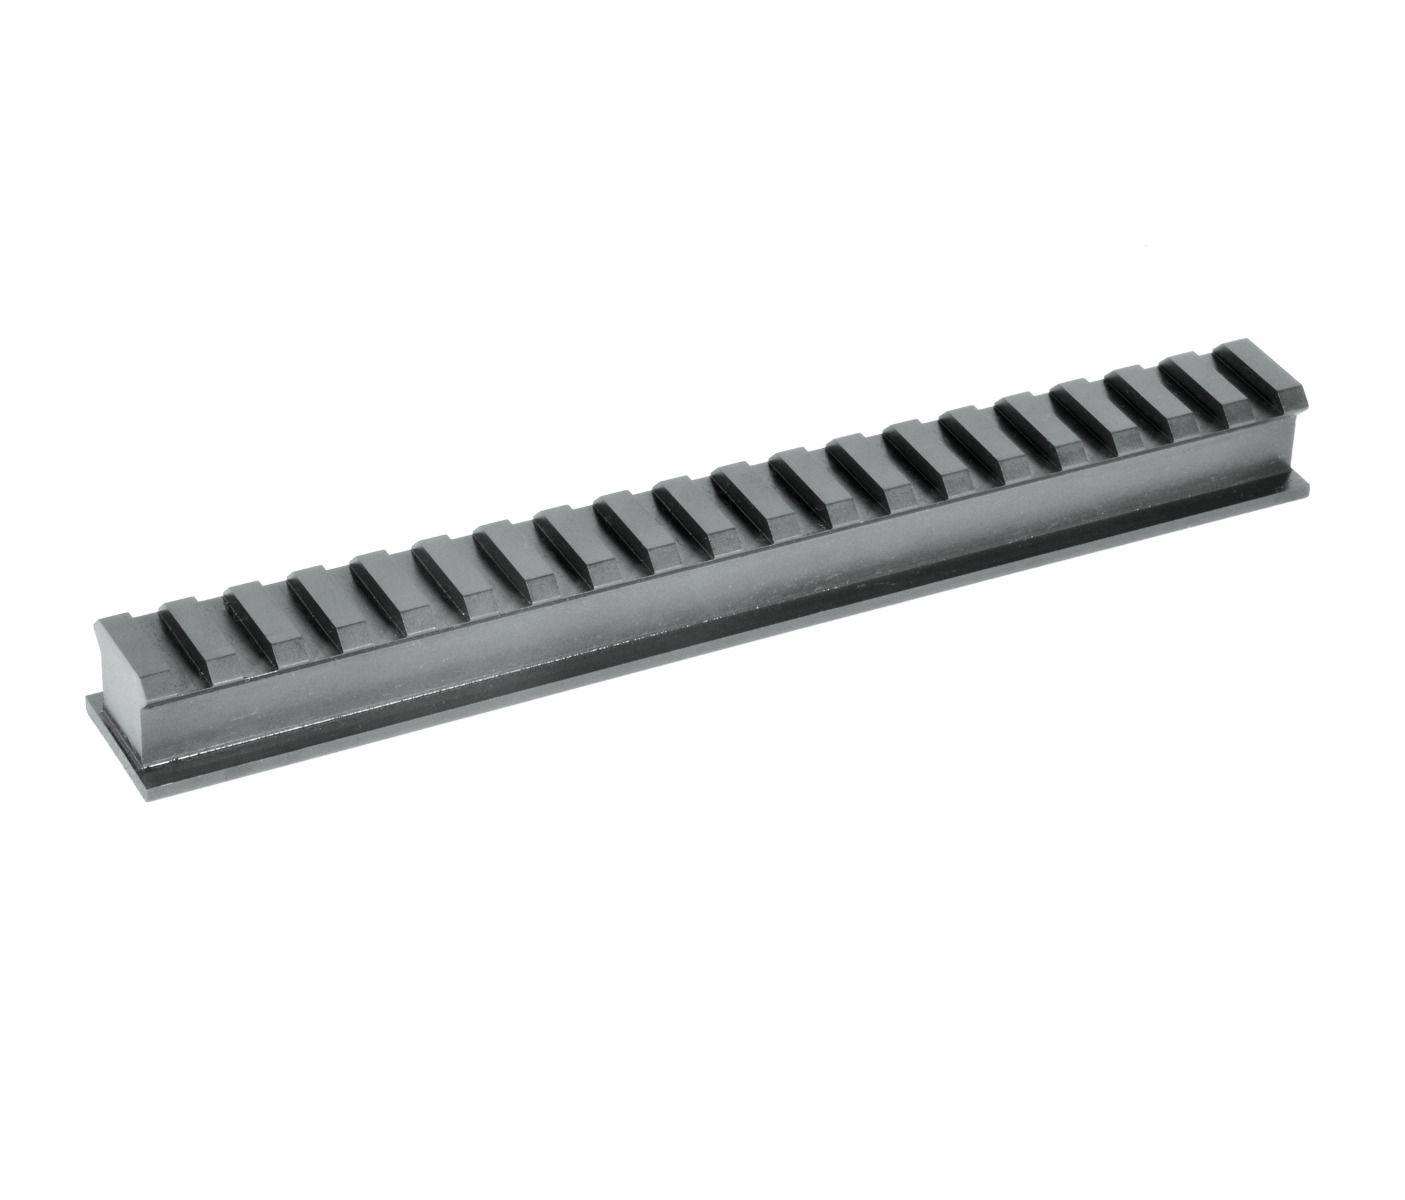 HD Picatinny Rail Blank 7075 Aluminum Black Anodized